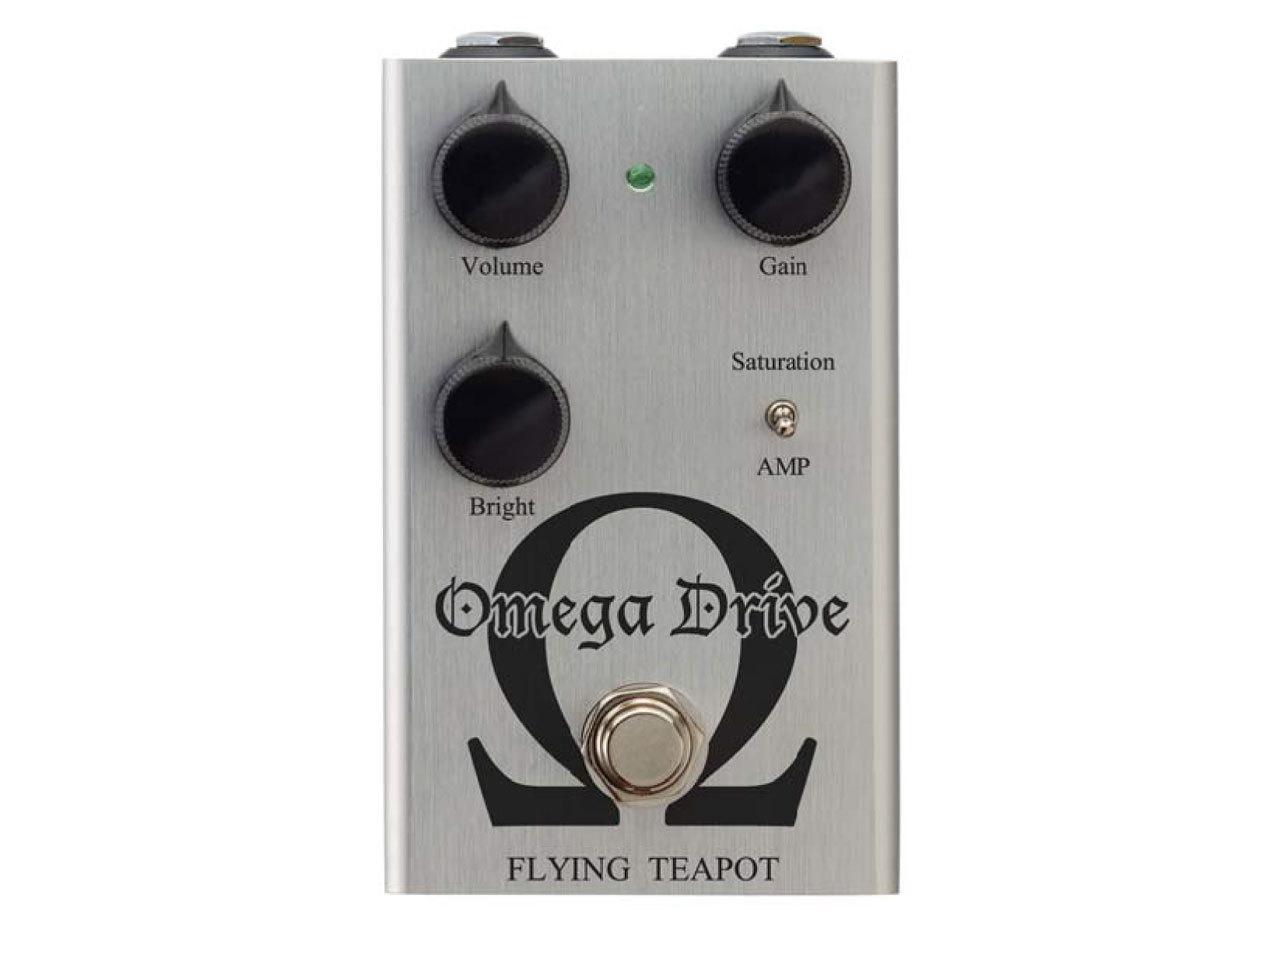 Flying Teapot Omega Drive